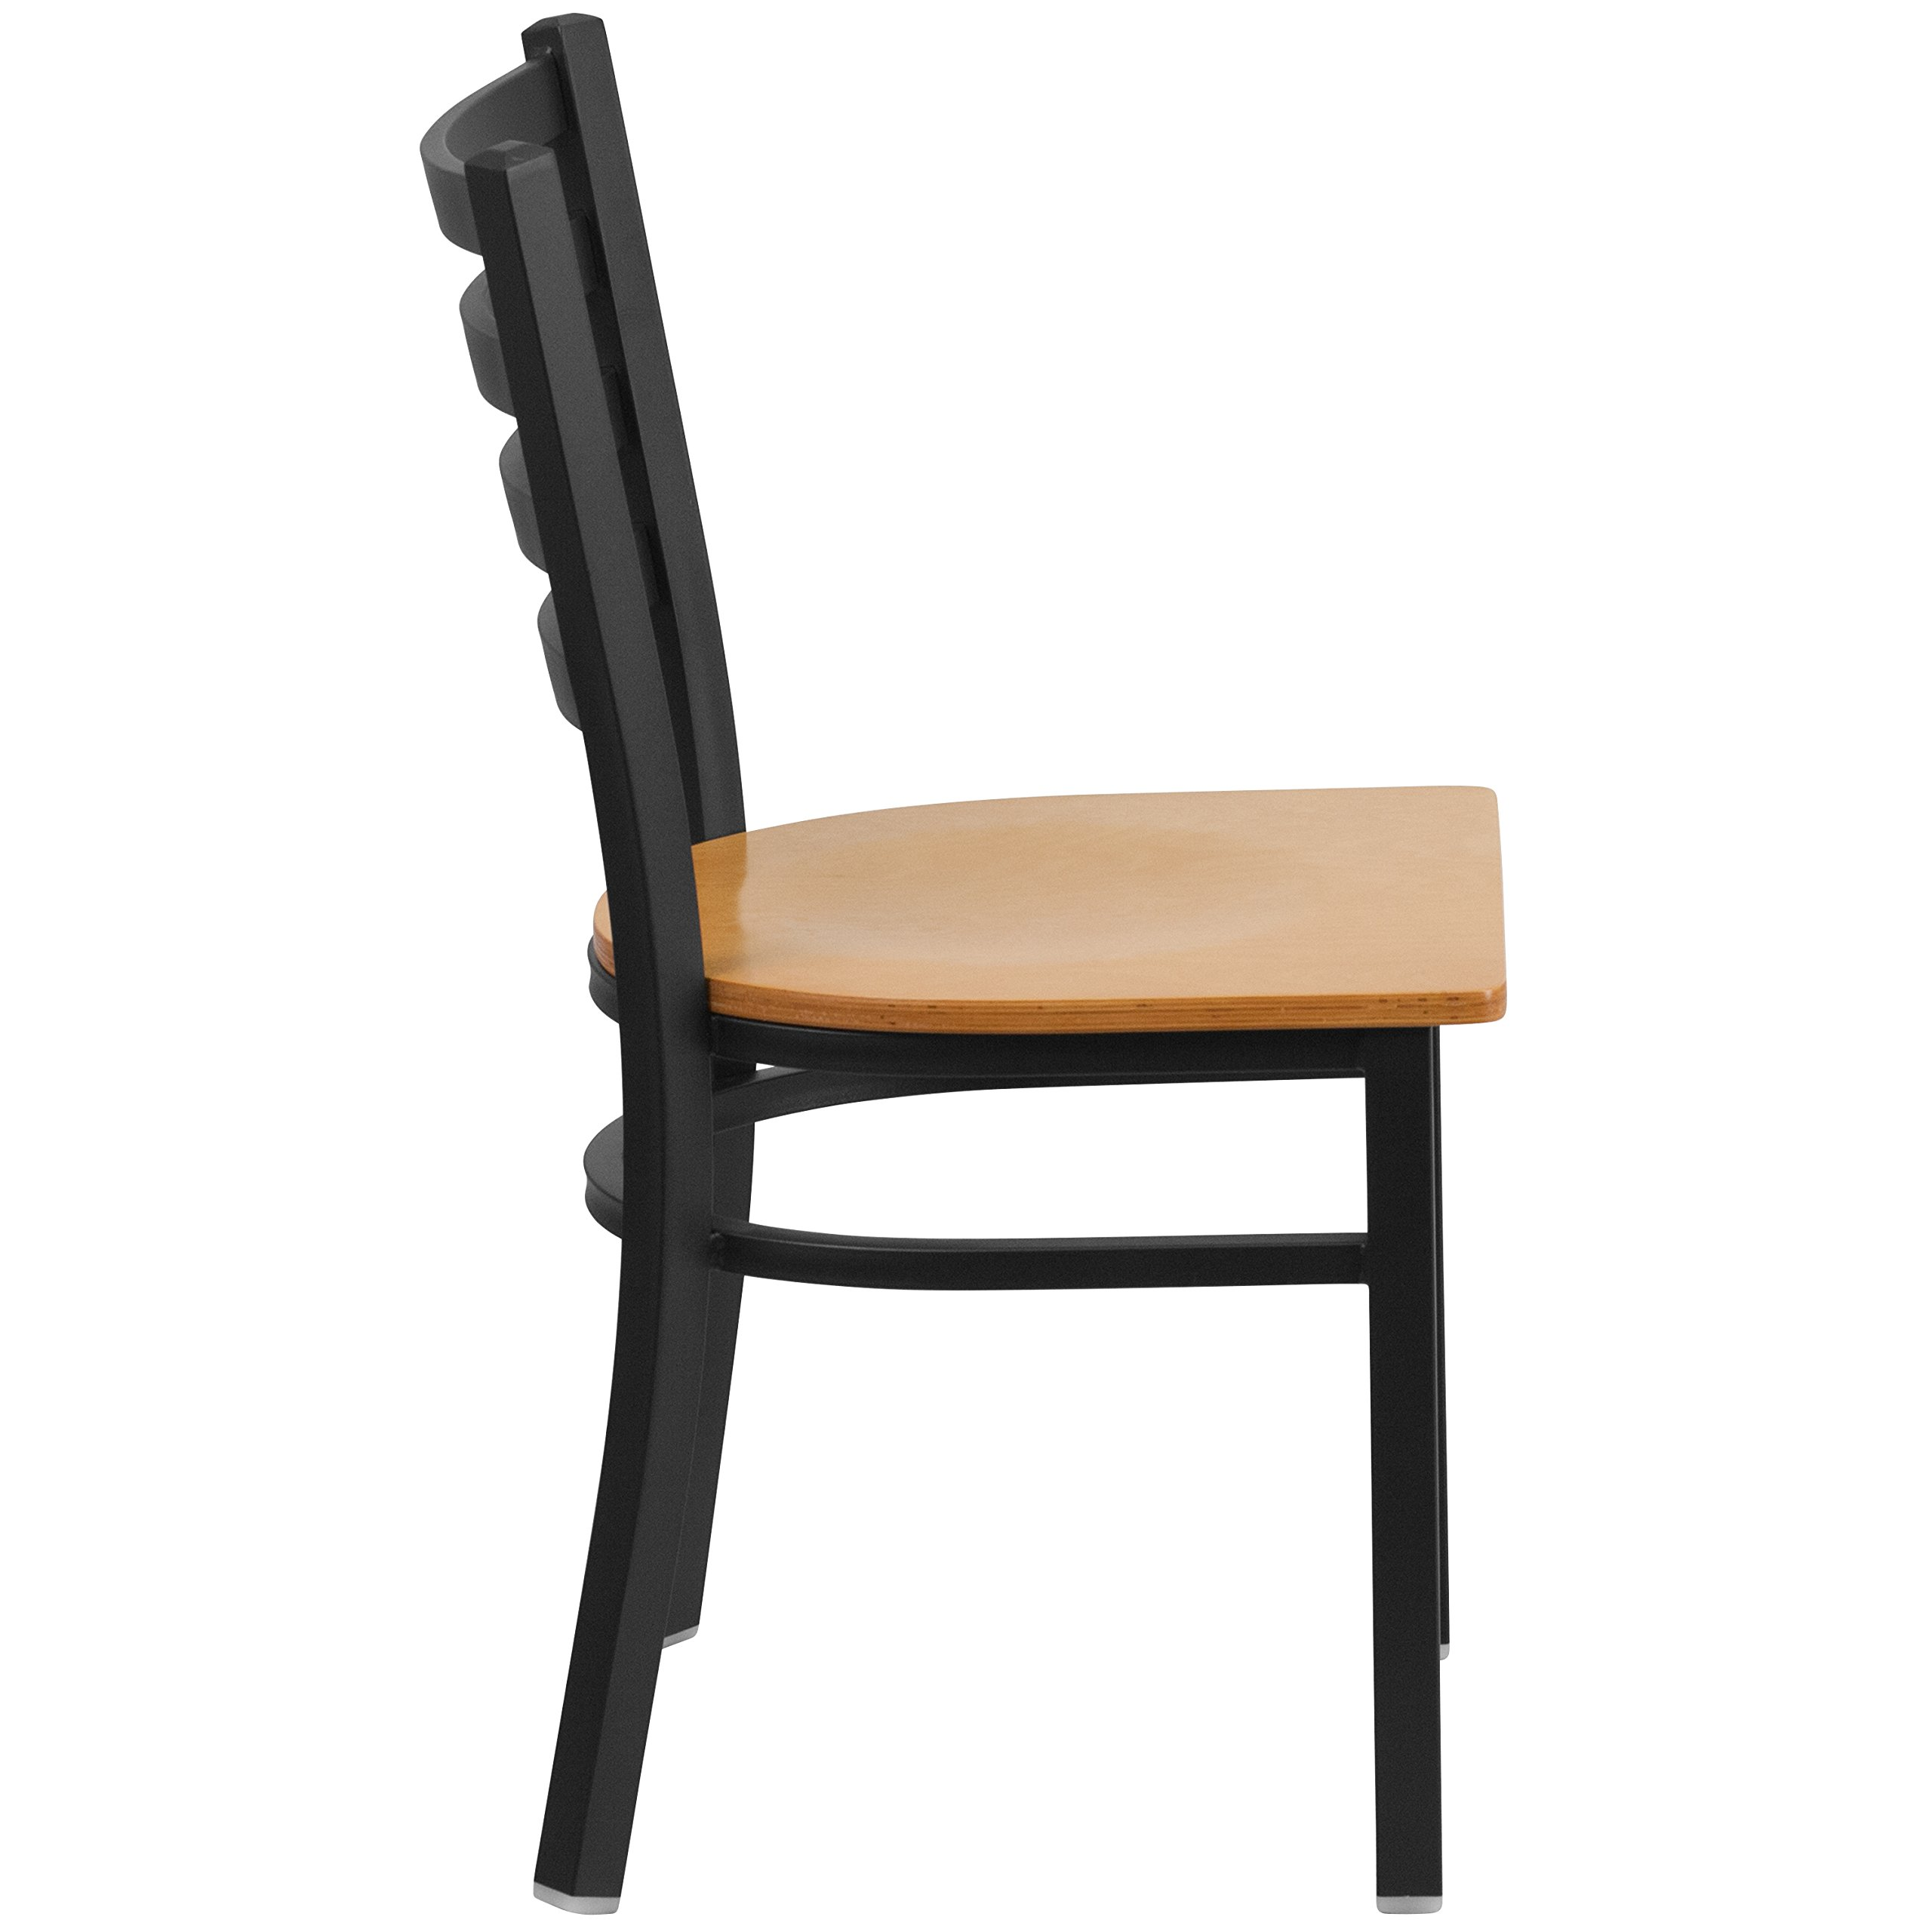 Flash Furniture HERCULES Series Black Ladder Back Metal Restaurant Chair - Natural Wood Seat by Flash Furniture (Image #2)